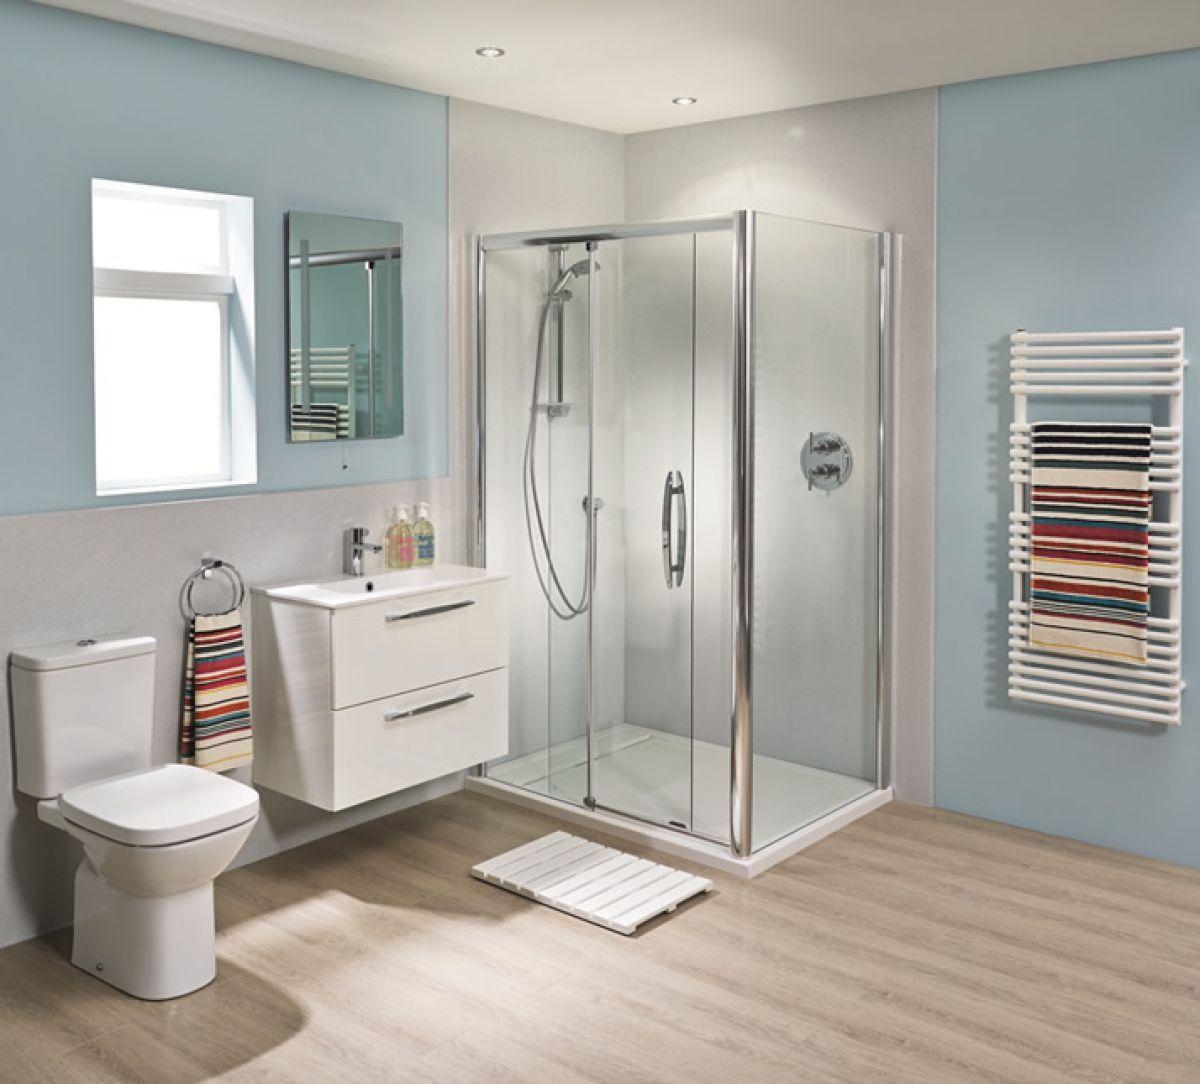 Shower wall panels shower panels waterproof wall panelling - Home Showers Shower Wall Panels